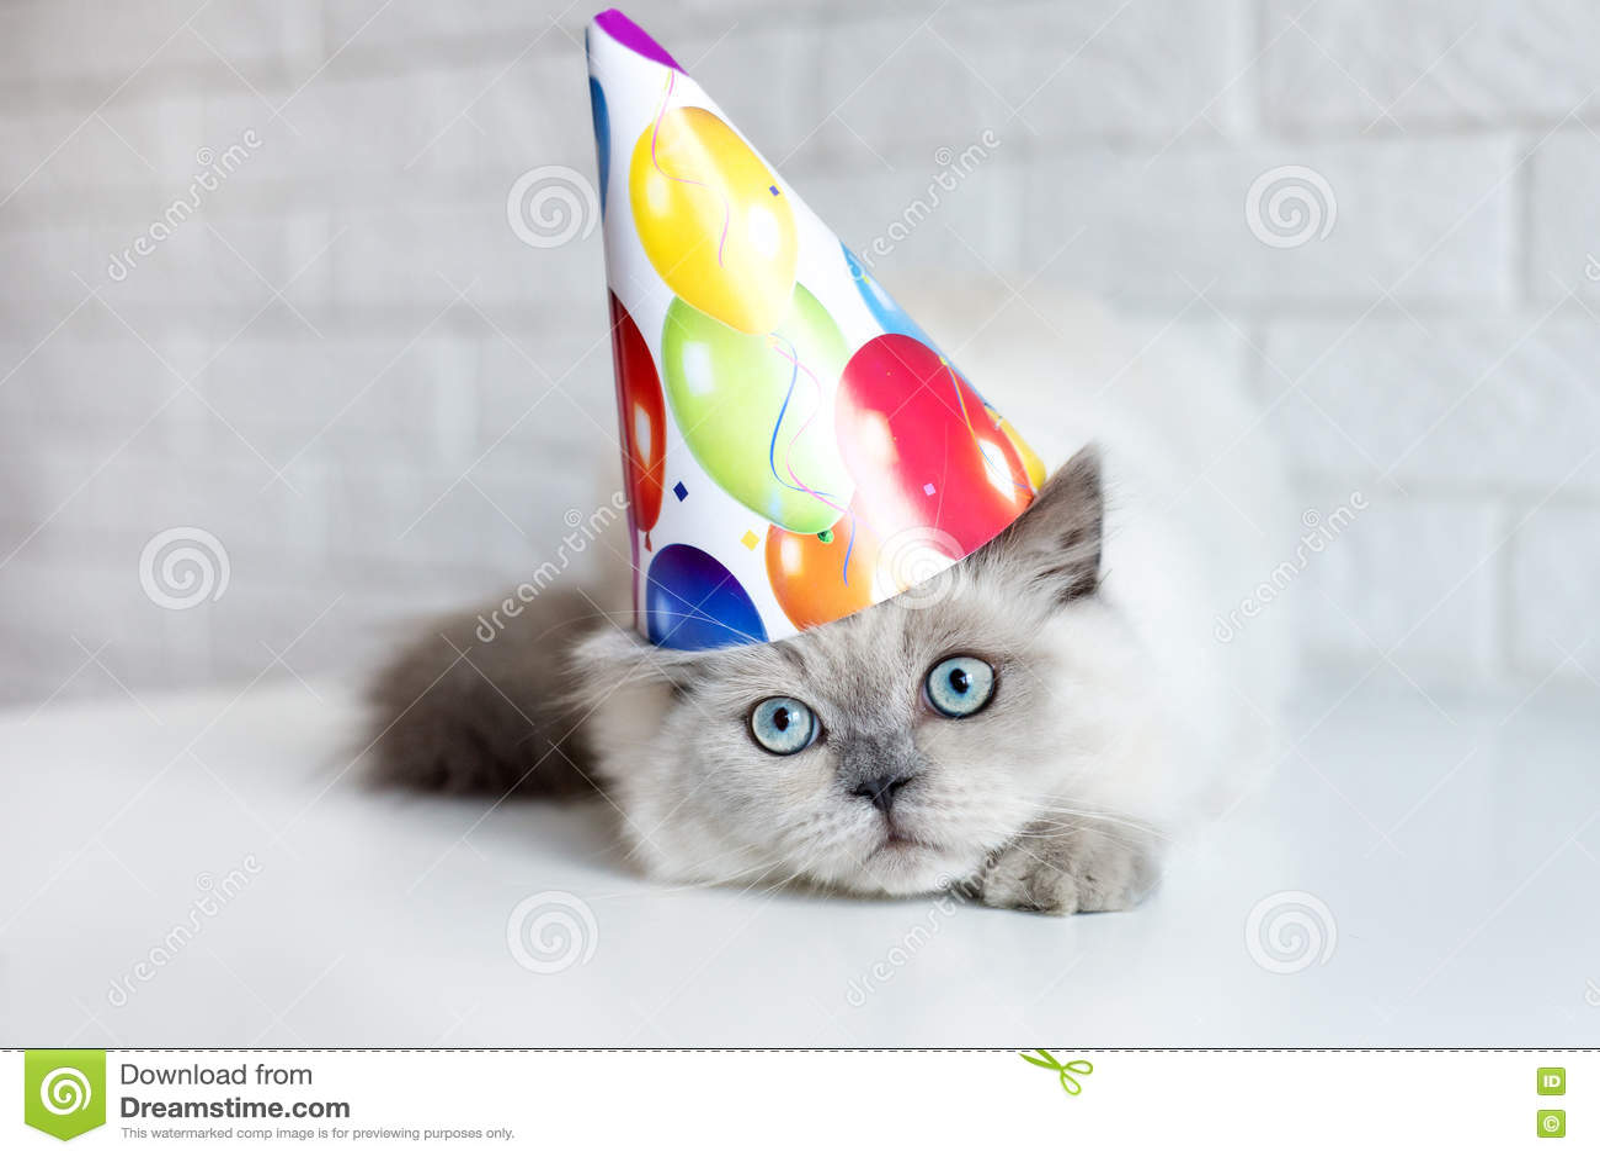 Fluffy Cat In A Birthday Hat